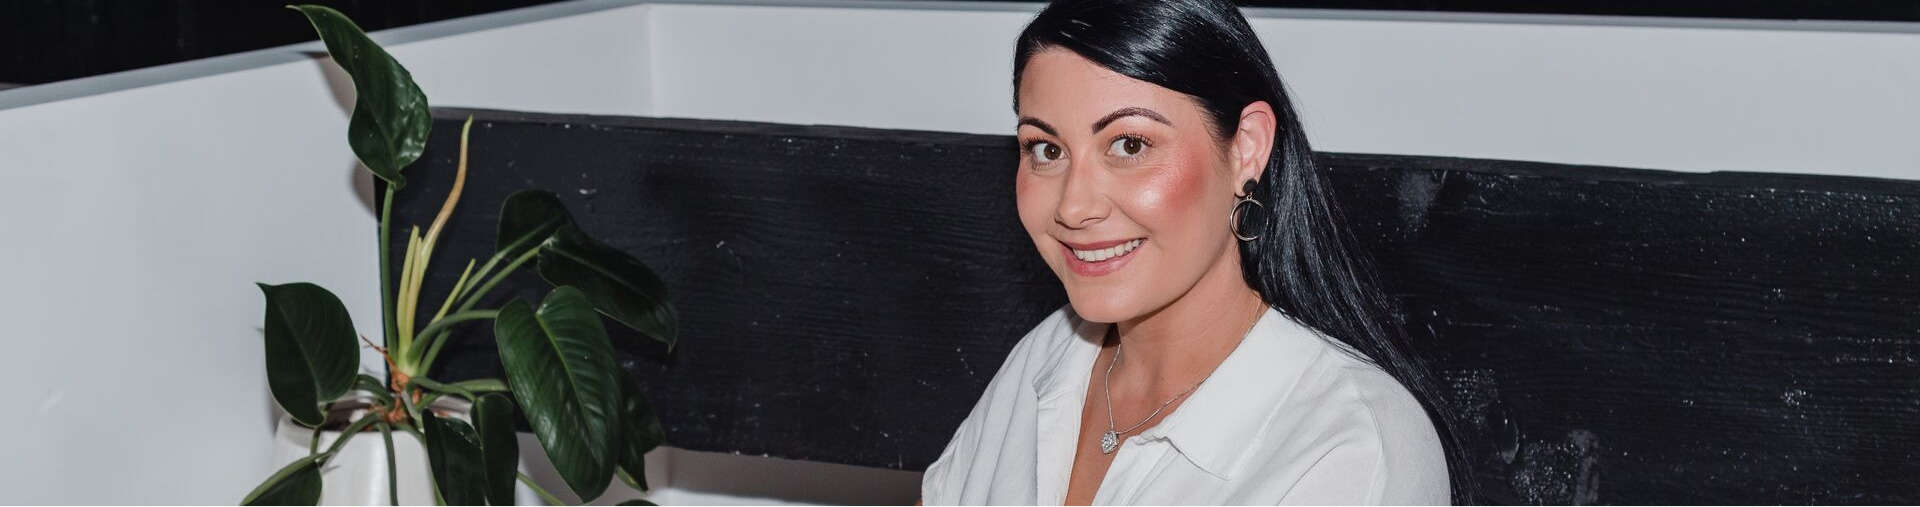 dark hair girl smiling